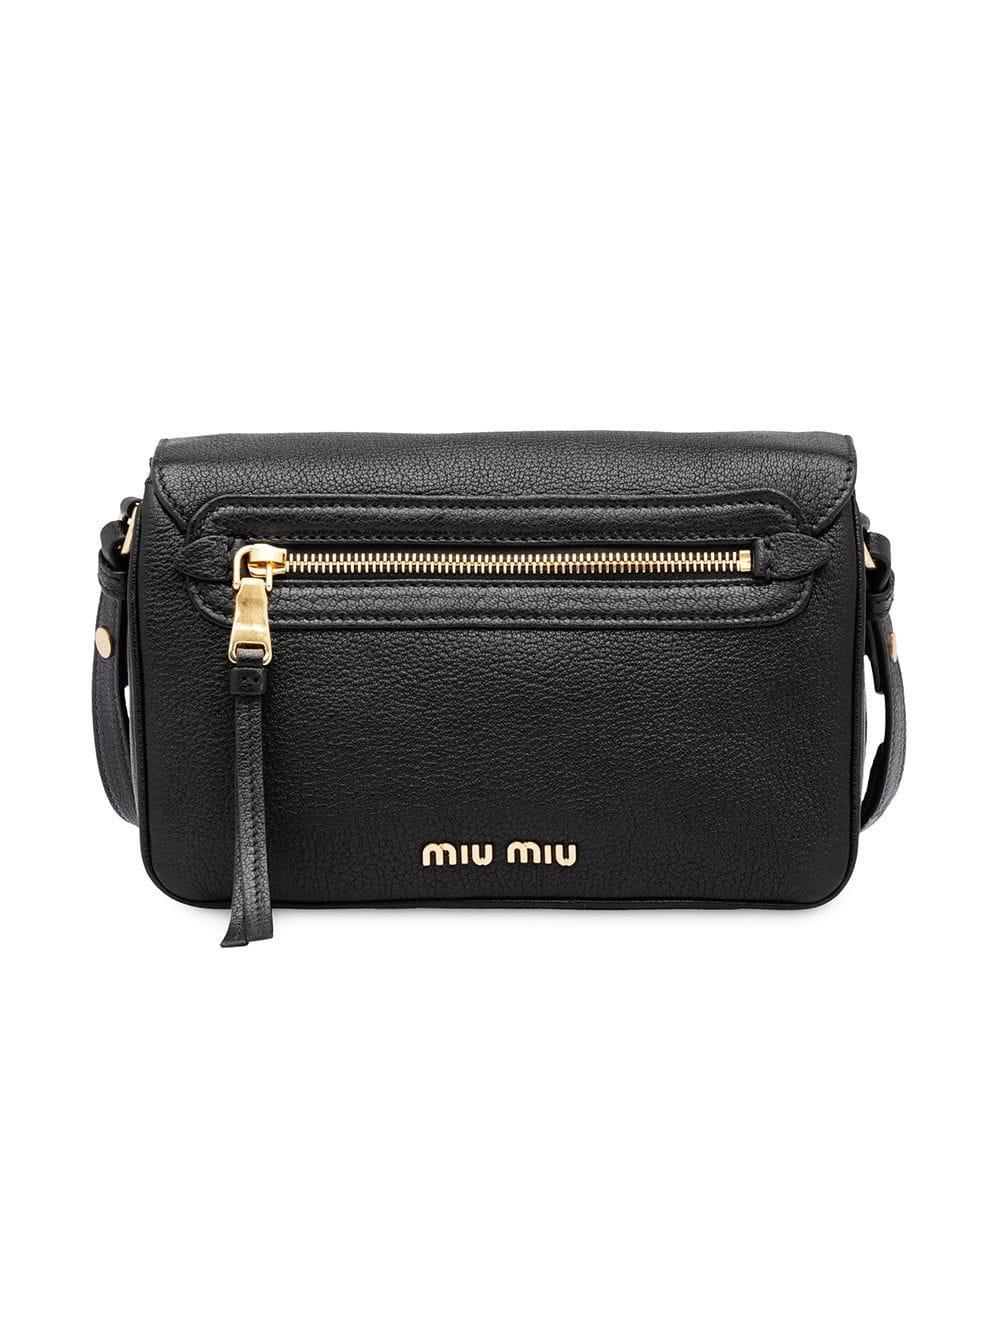 Miu Miu Foldover Top Shoulder Bag in Black - Save 54% - Lyst 3606ca48ae781